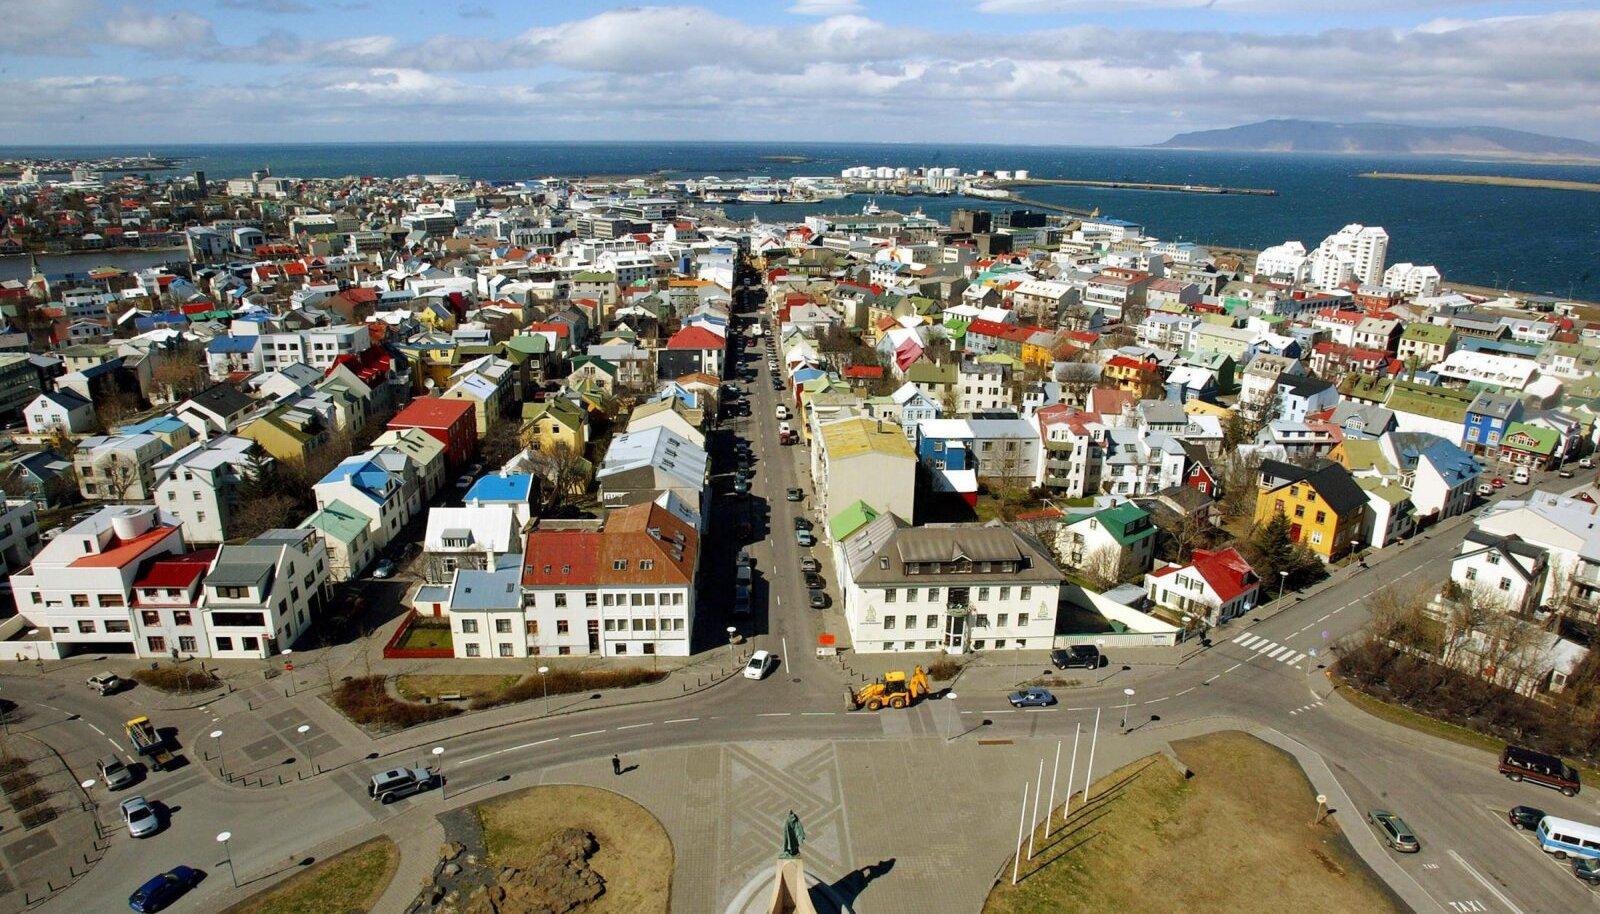 Islandi pealinn Reykjavik